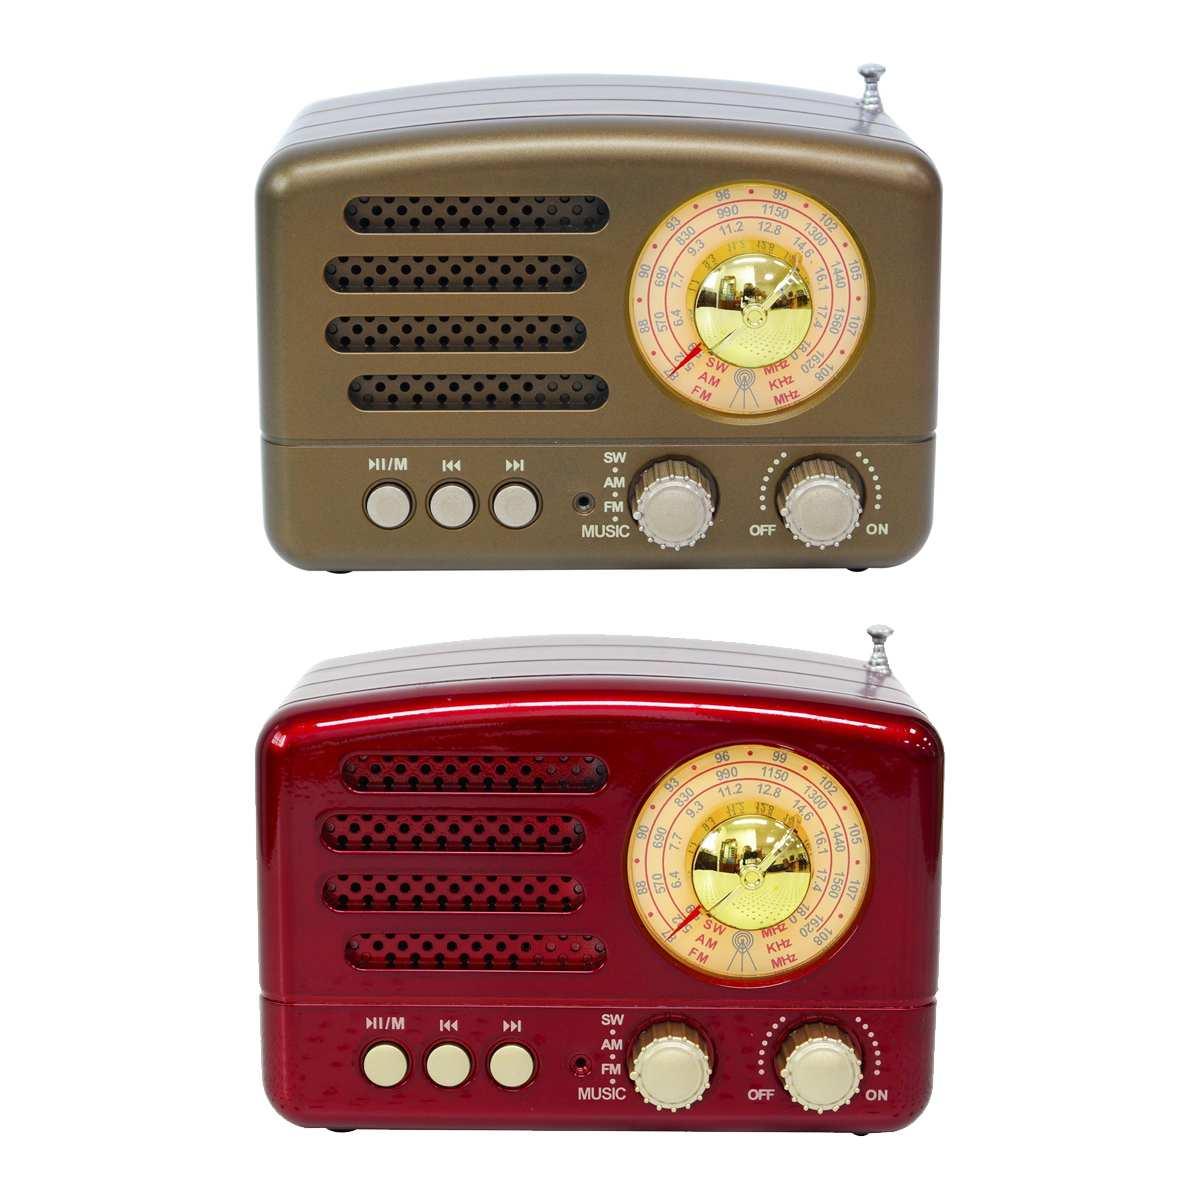 130x90x70mm Red/Coffee Portable Vintage Retro Radio AM FM SW bluetooth Speaker TF Card Slot USB Charging Home Travel Mini Radio